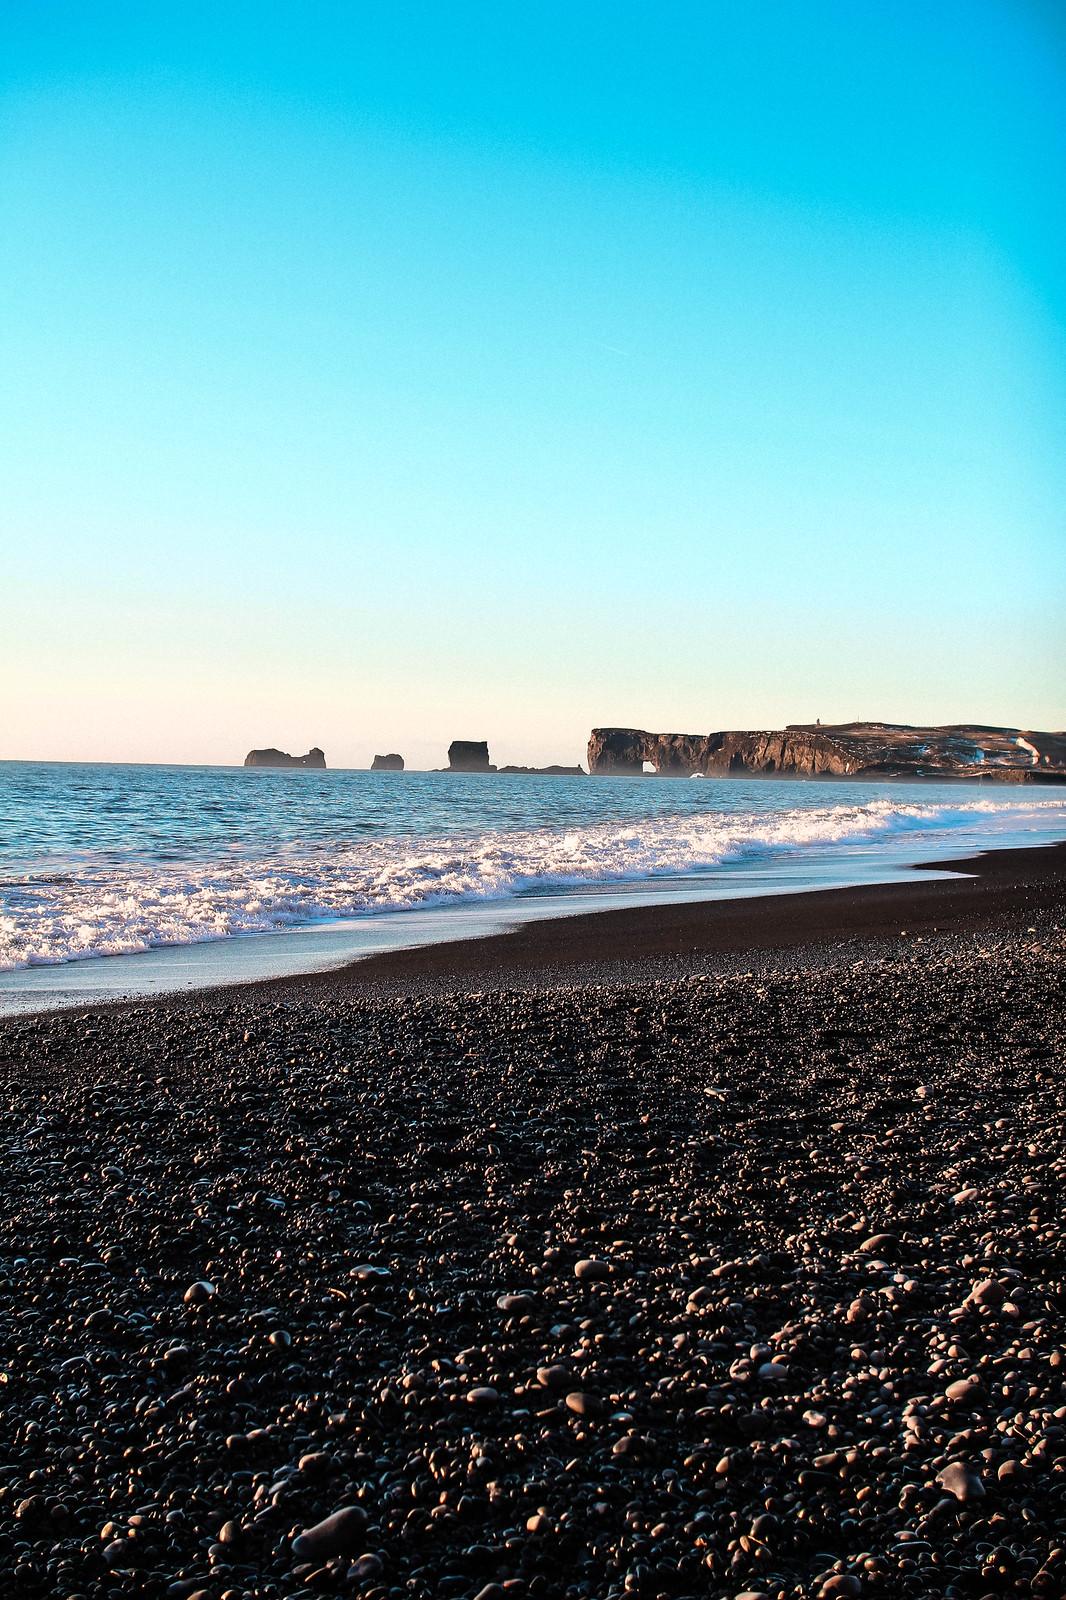 Reynisfjara Vik Black Sands Beach Iceland travel blogger UK The Little Things